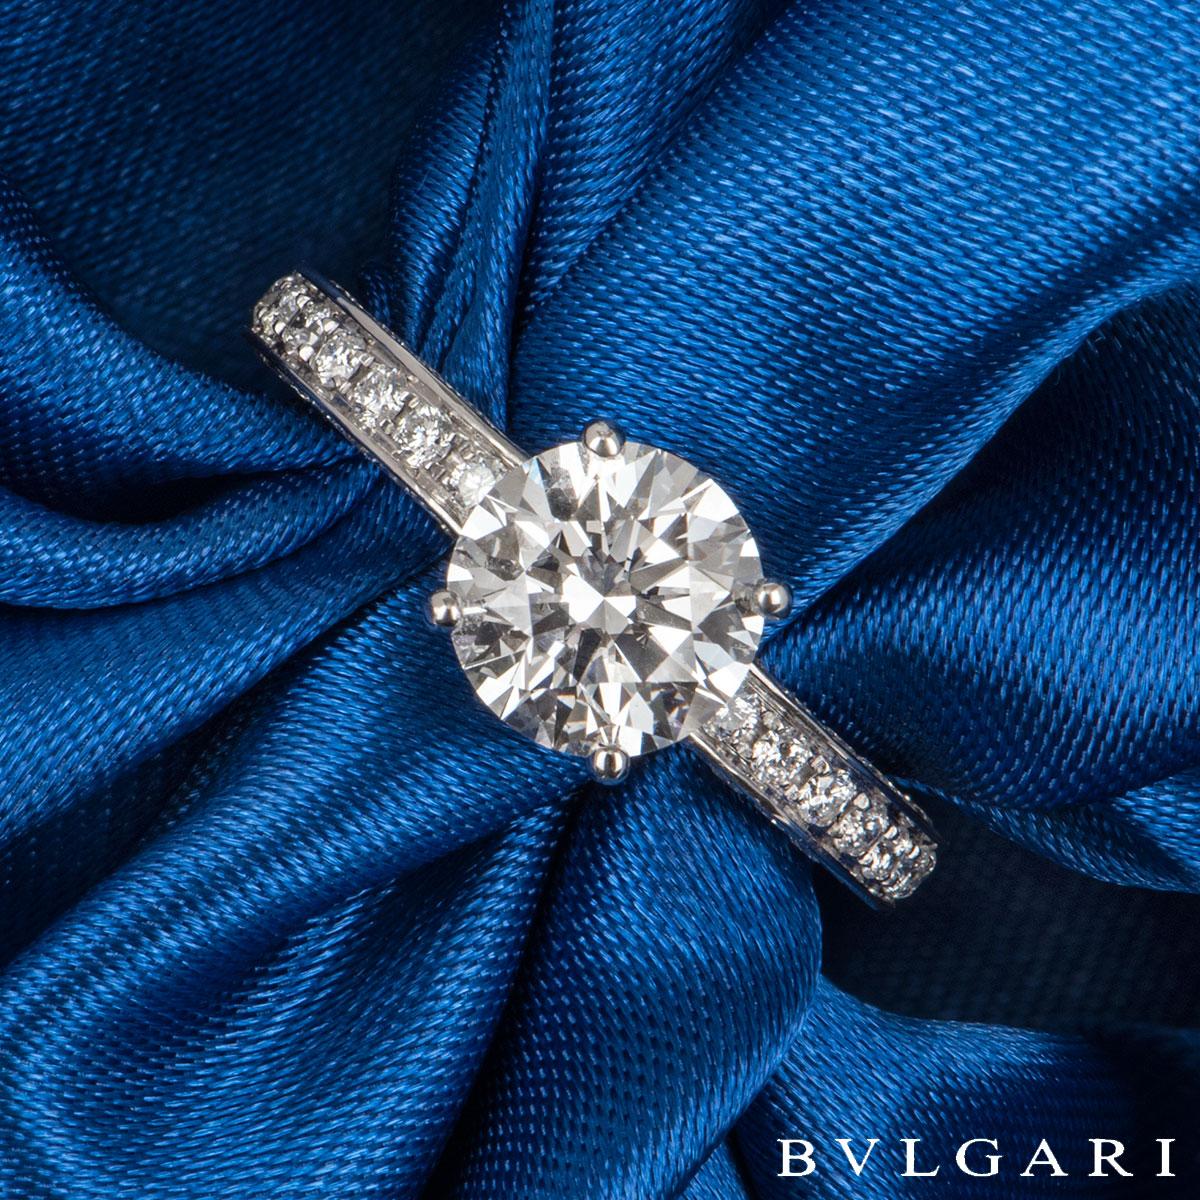 Bvlgari Platinum Diamond Dedicata A Venezia Ring 1.50ct D/VS2